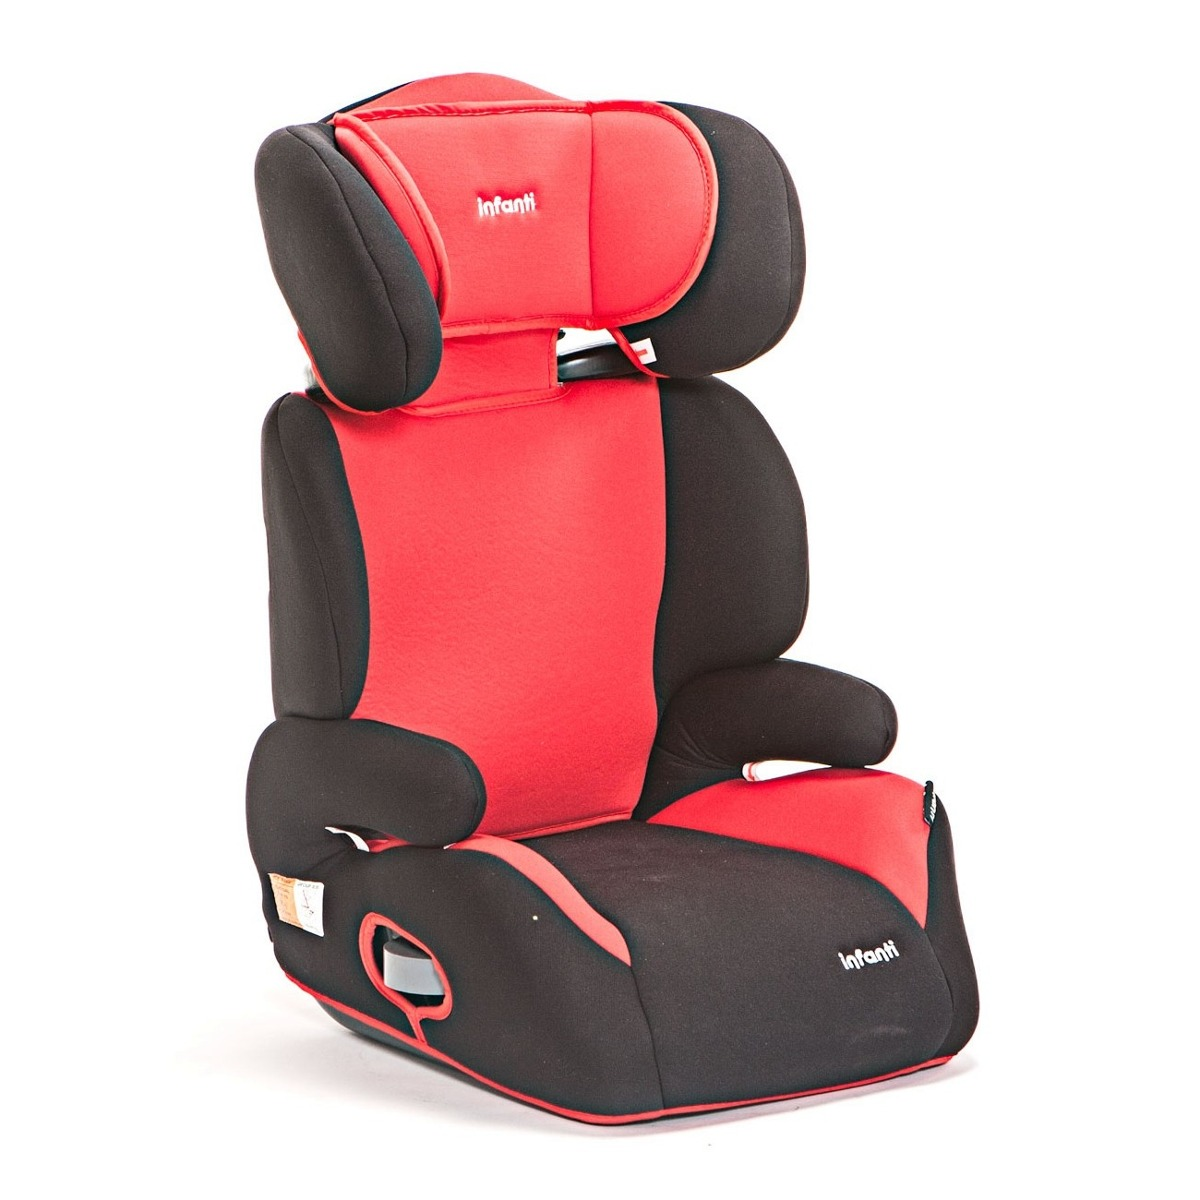 cfb447a7a silla para auto infanti n101 respaldo desmontable 15-36 kg. Cargando zoom.